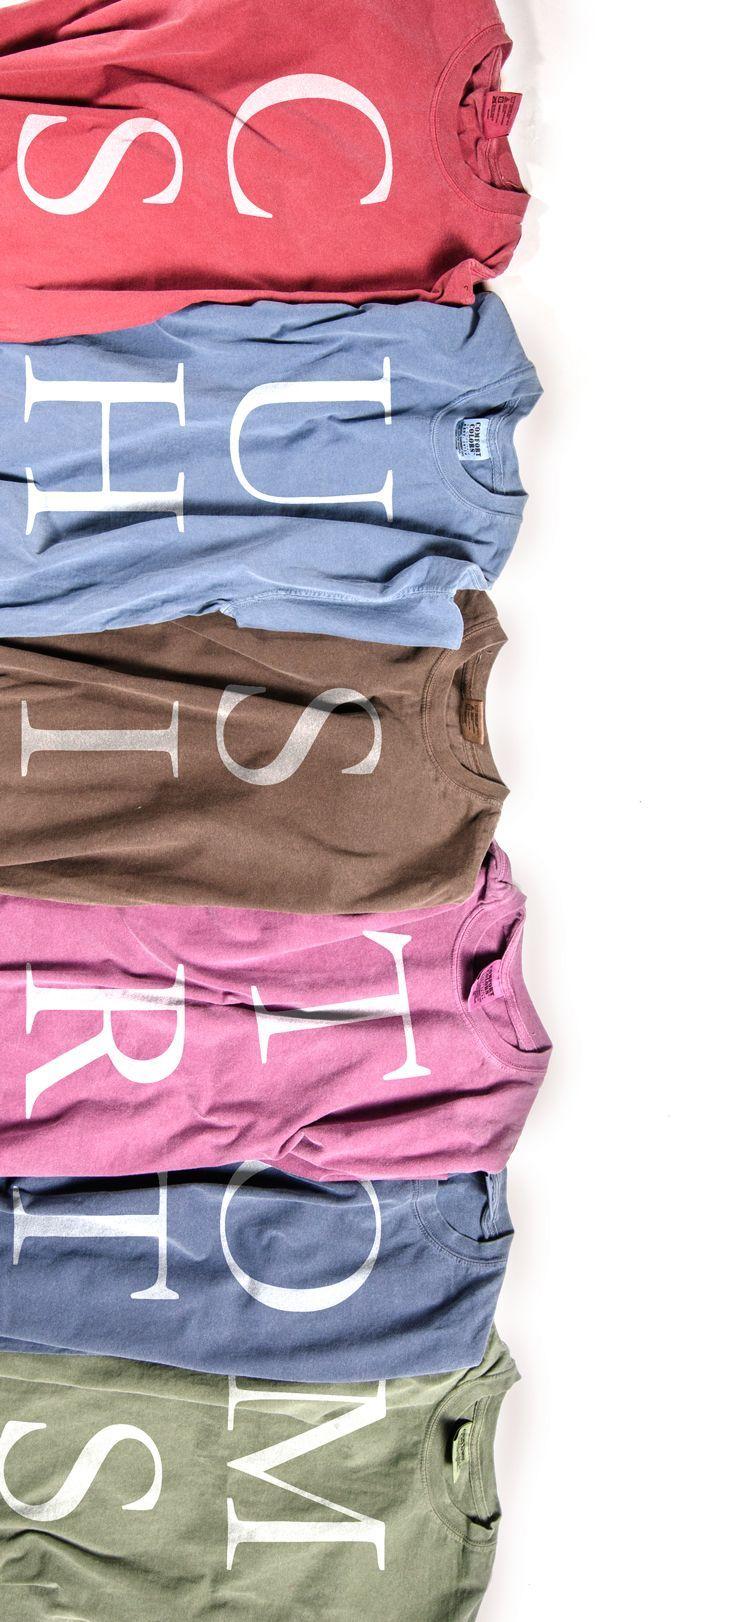 Design your own hello kitty t-shirt - Design Your Own T Shirts At Uberprints Com Uberprints